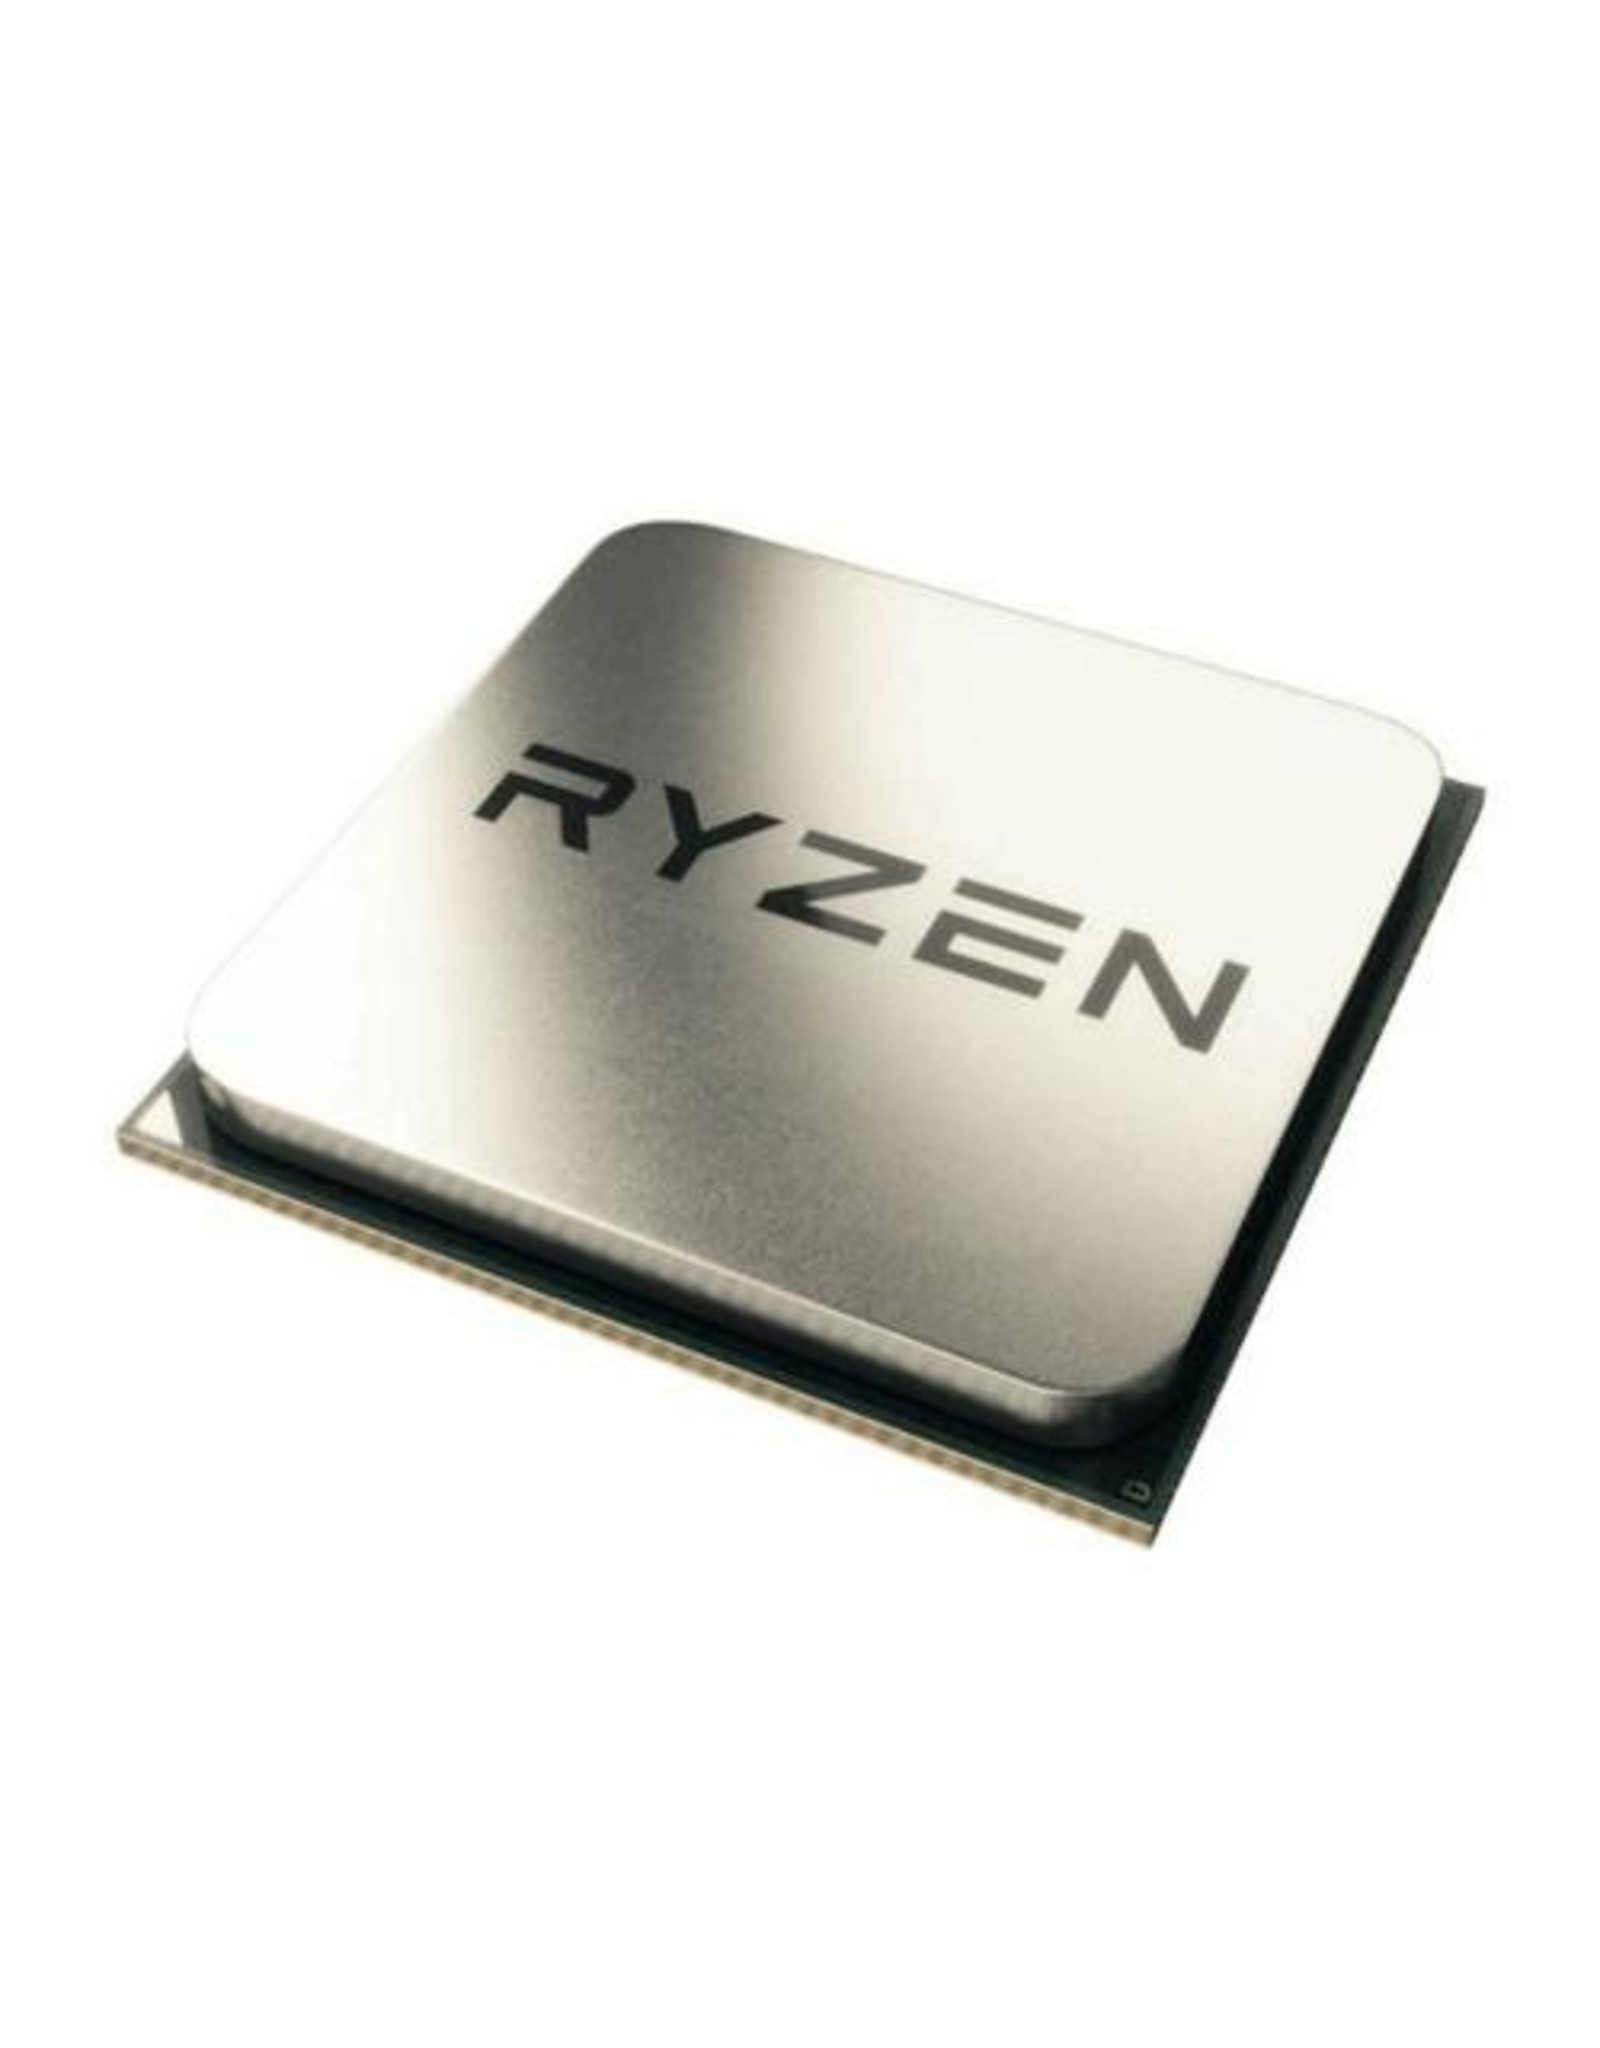 AMD CPU  Ryzen 5 3600X  / 6core / AM4 /  / 3.8-4.4GHz / Boxed